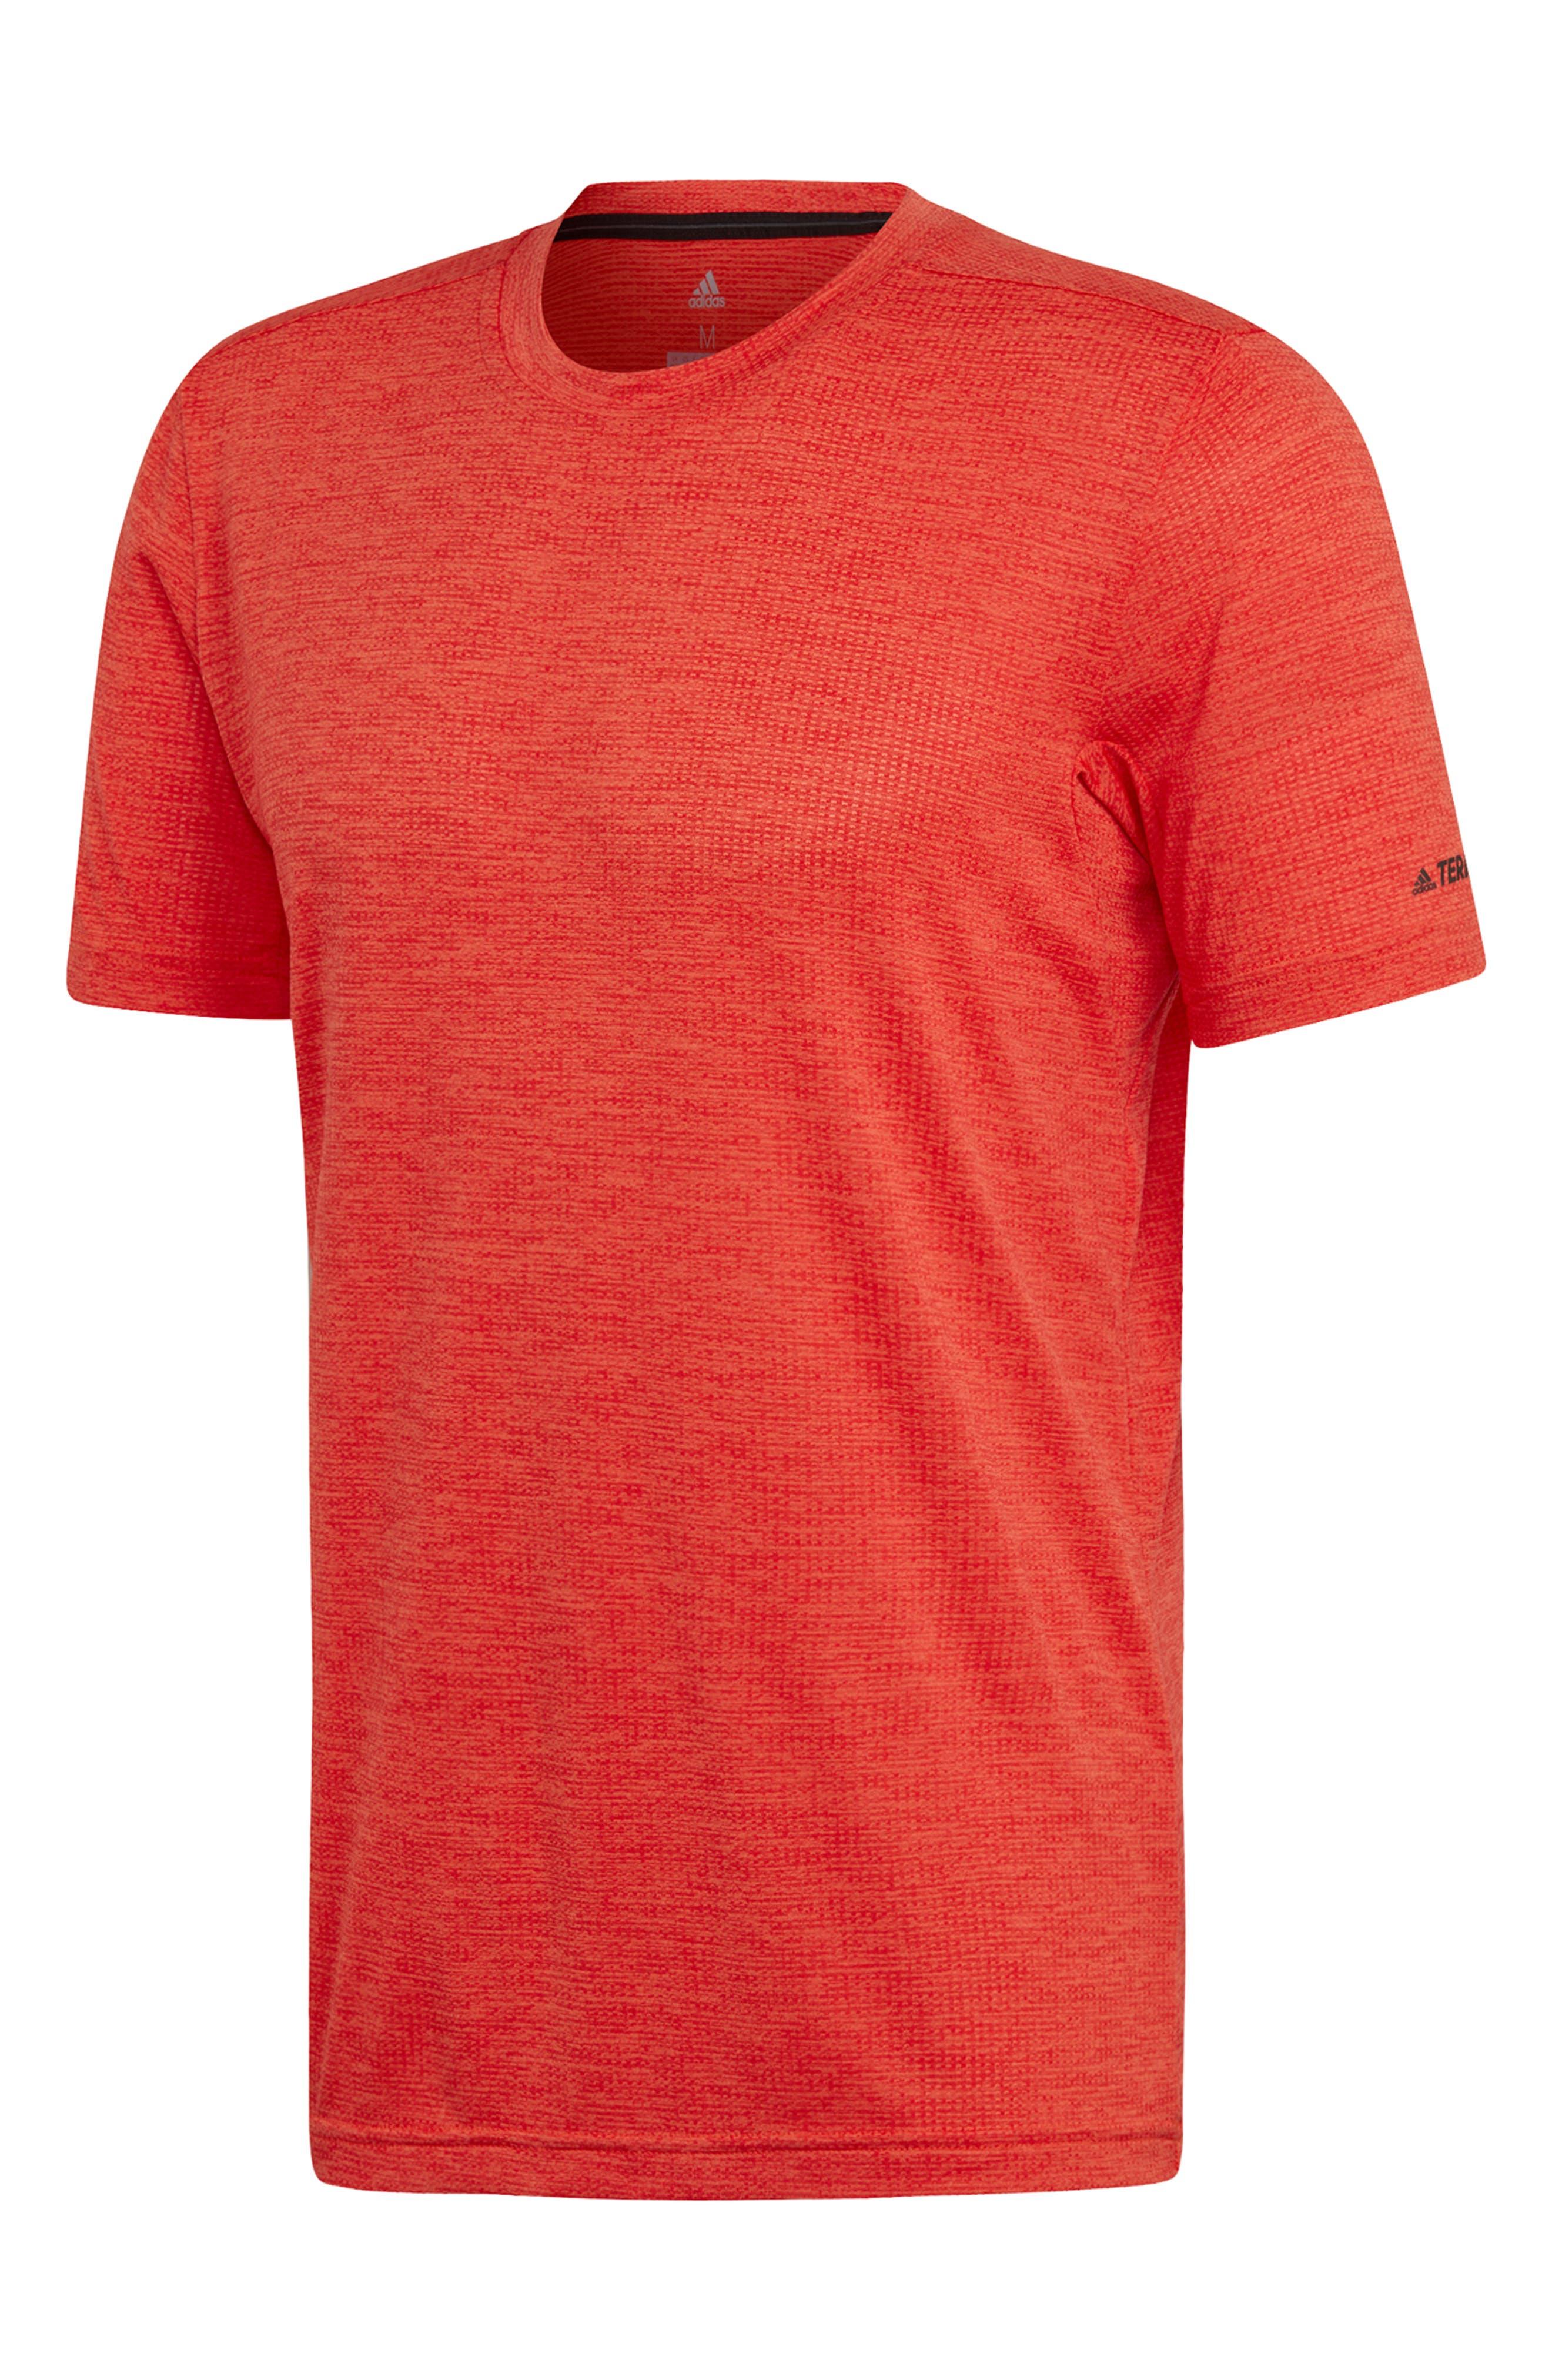 Adidas Tivid Climalite T-Shirt, Orange